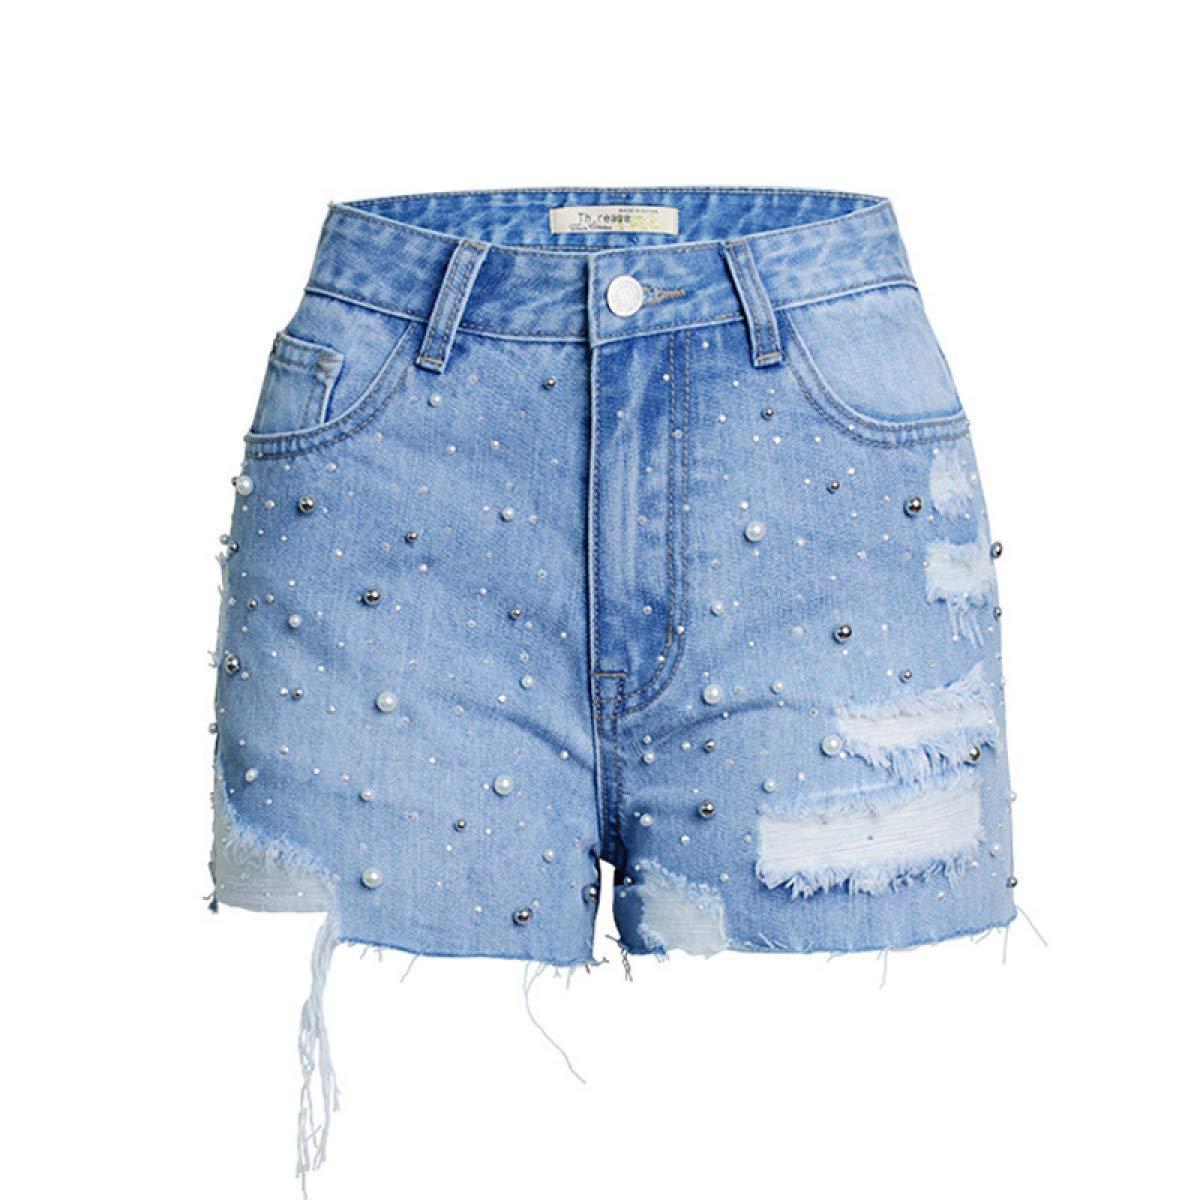 Beaded denim shorts MYKIO SHOP High Waist Denim Shorts Peals Beaded Ripped Jeans Shorts Womens Casual Summer Plus Size